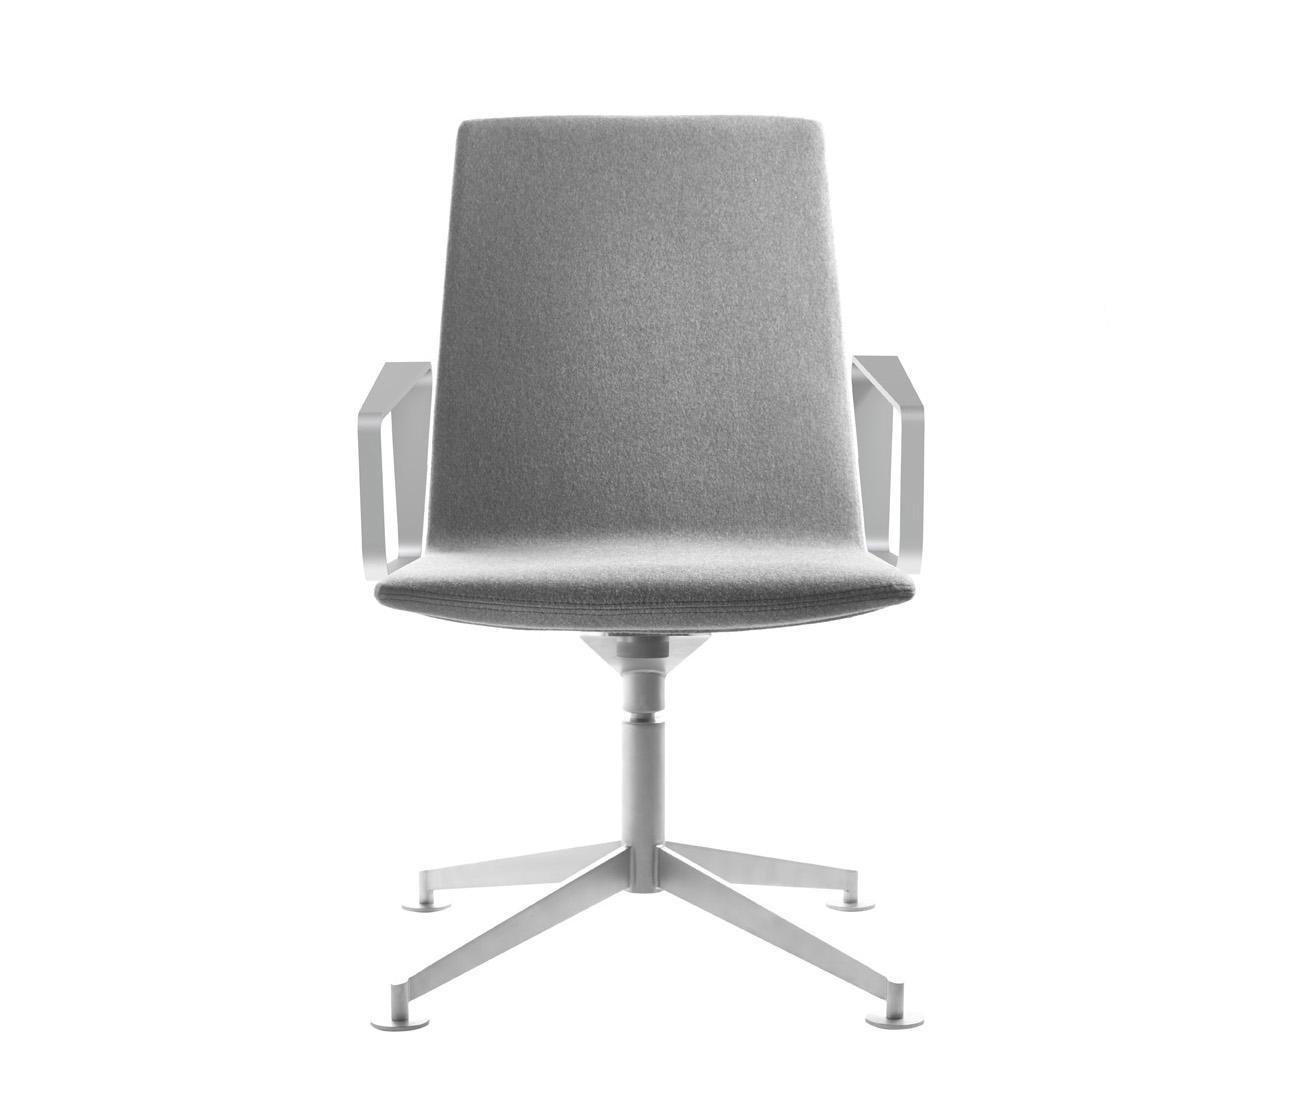 swing task chair st hle von leland international architonic. Black Bedroom Furniture Sets. Home Design Ideas